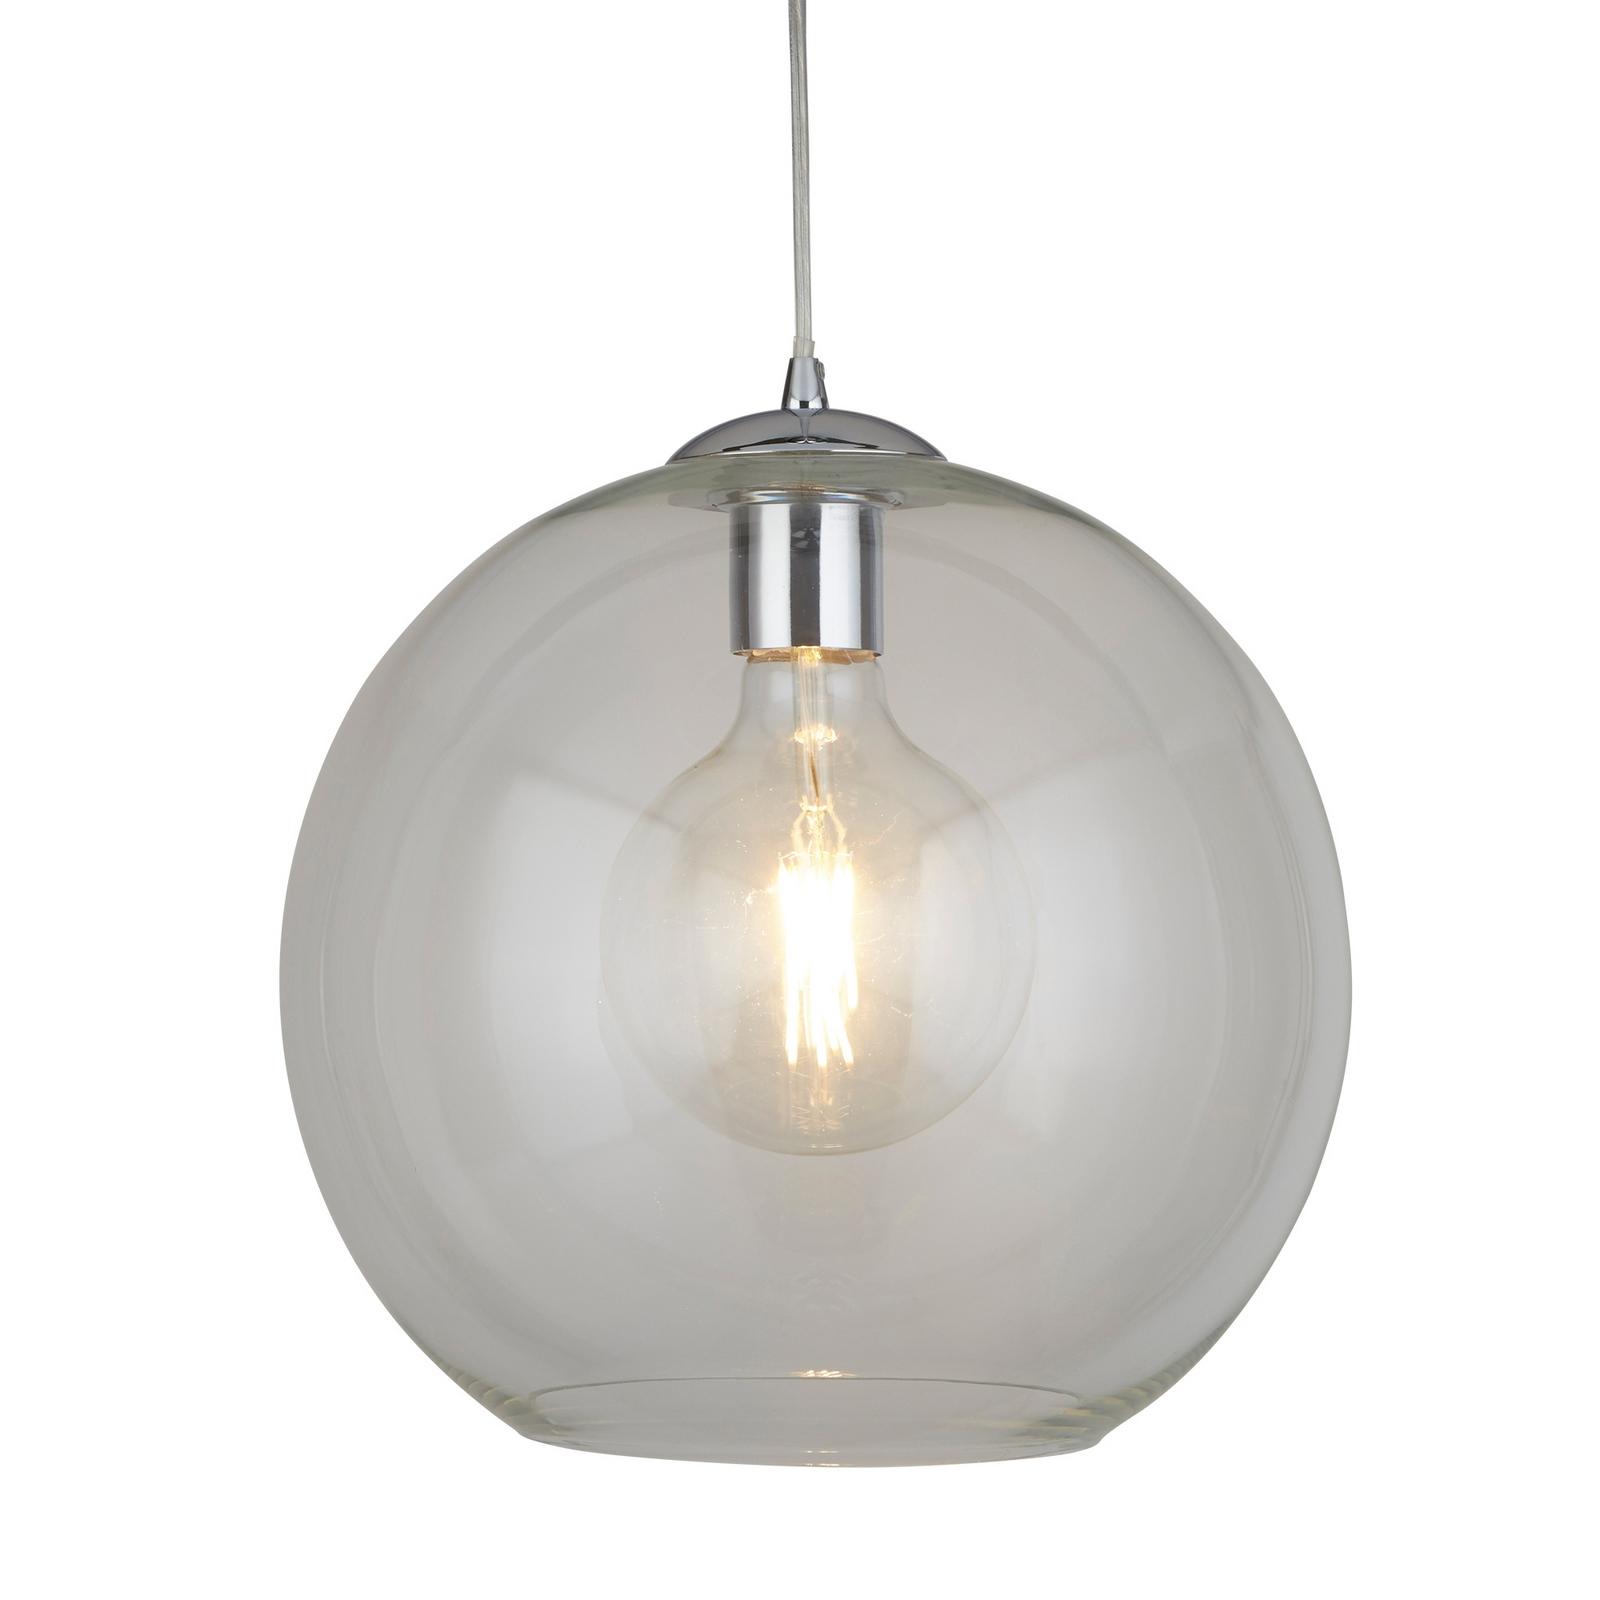 BALLS 1 LIGHT ROUND PENDANT (30CM DIA) CLEAR GLASS